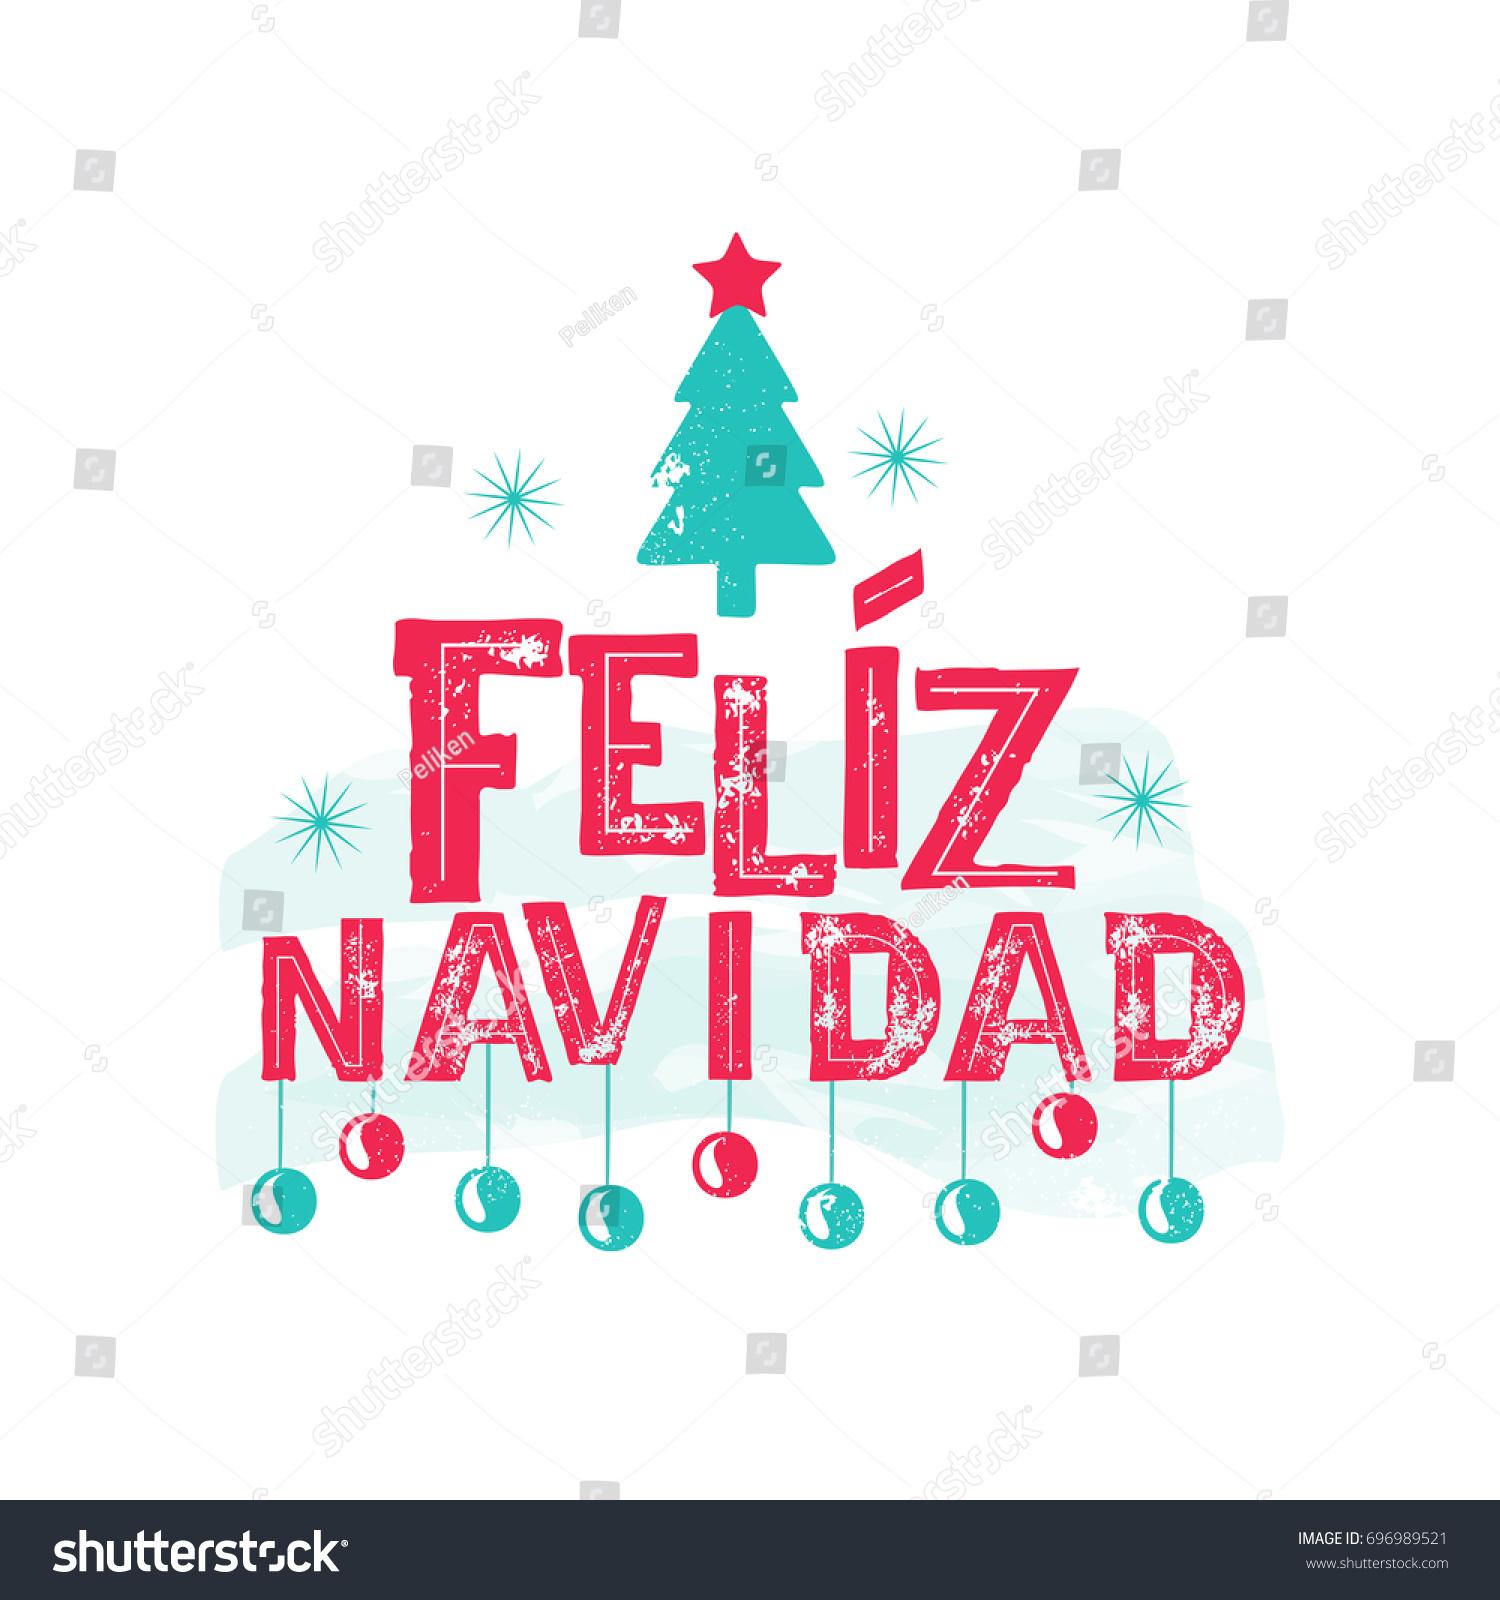 stock vector feliz navidad merry christmas spanish language happy new year card with tree and fireworks 696989521